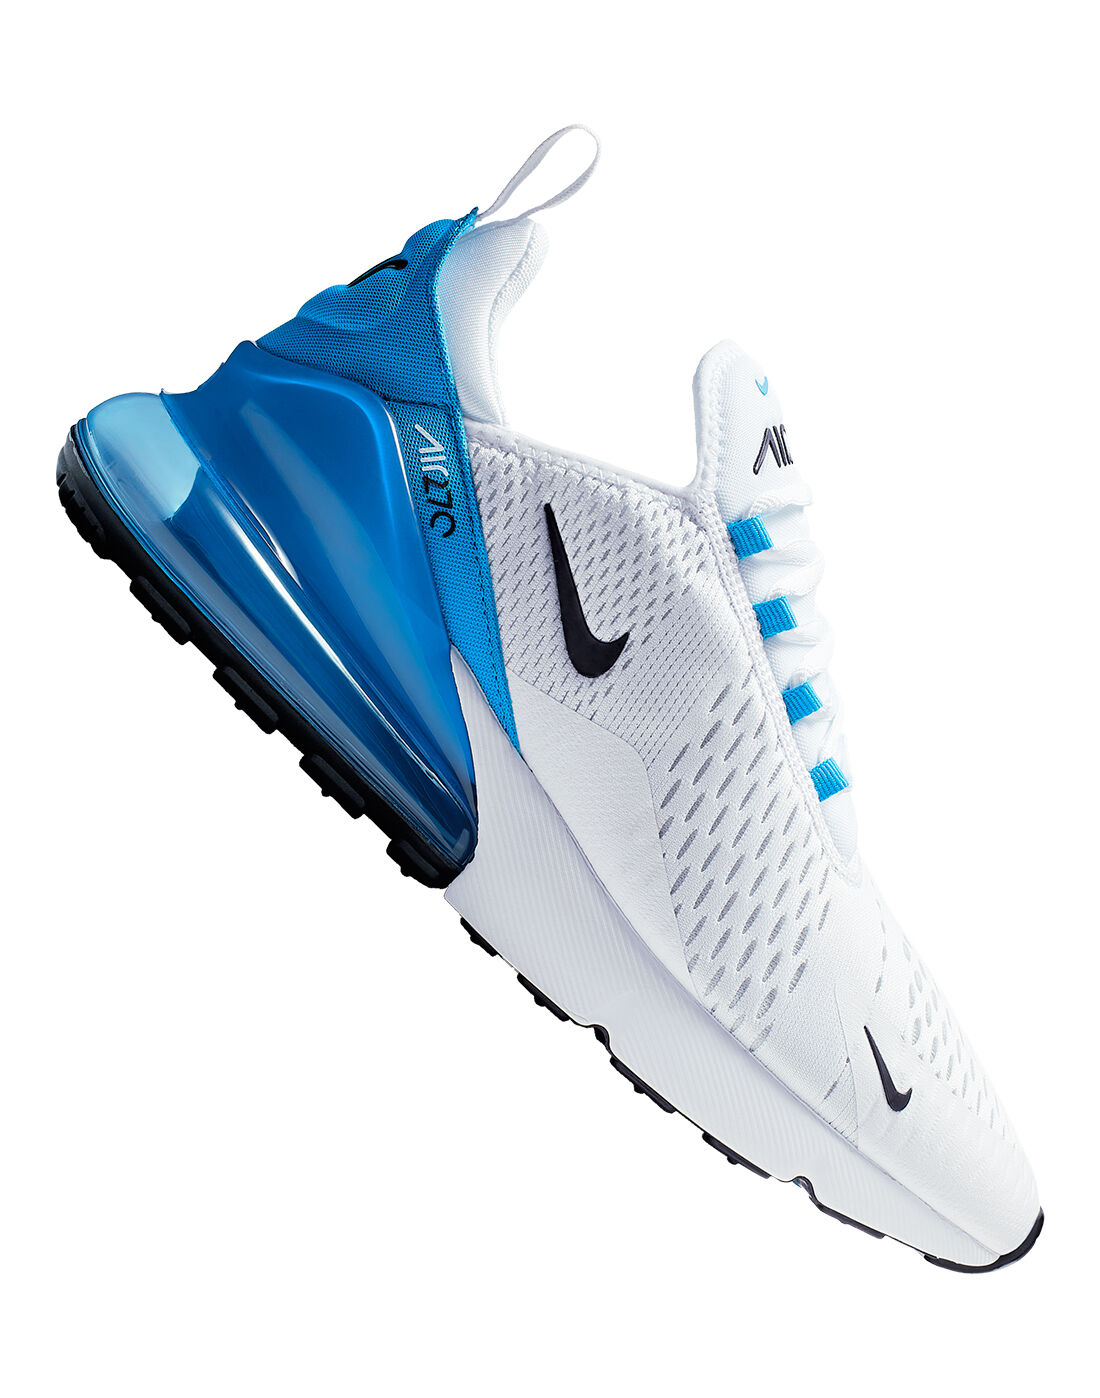 Men's Blue \u0026 White Nike Air Max 270